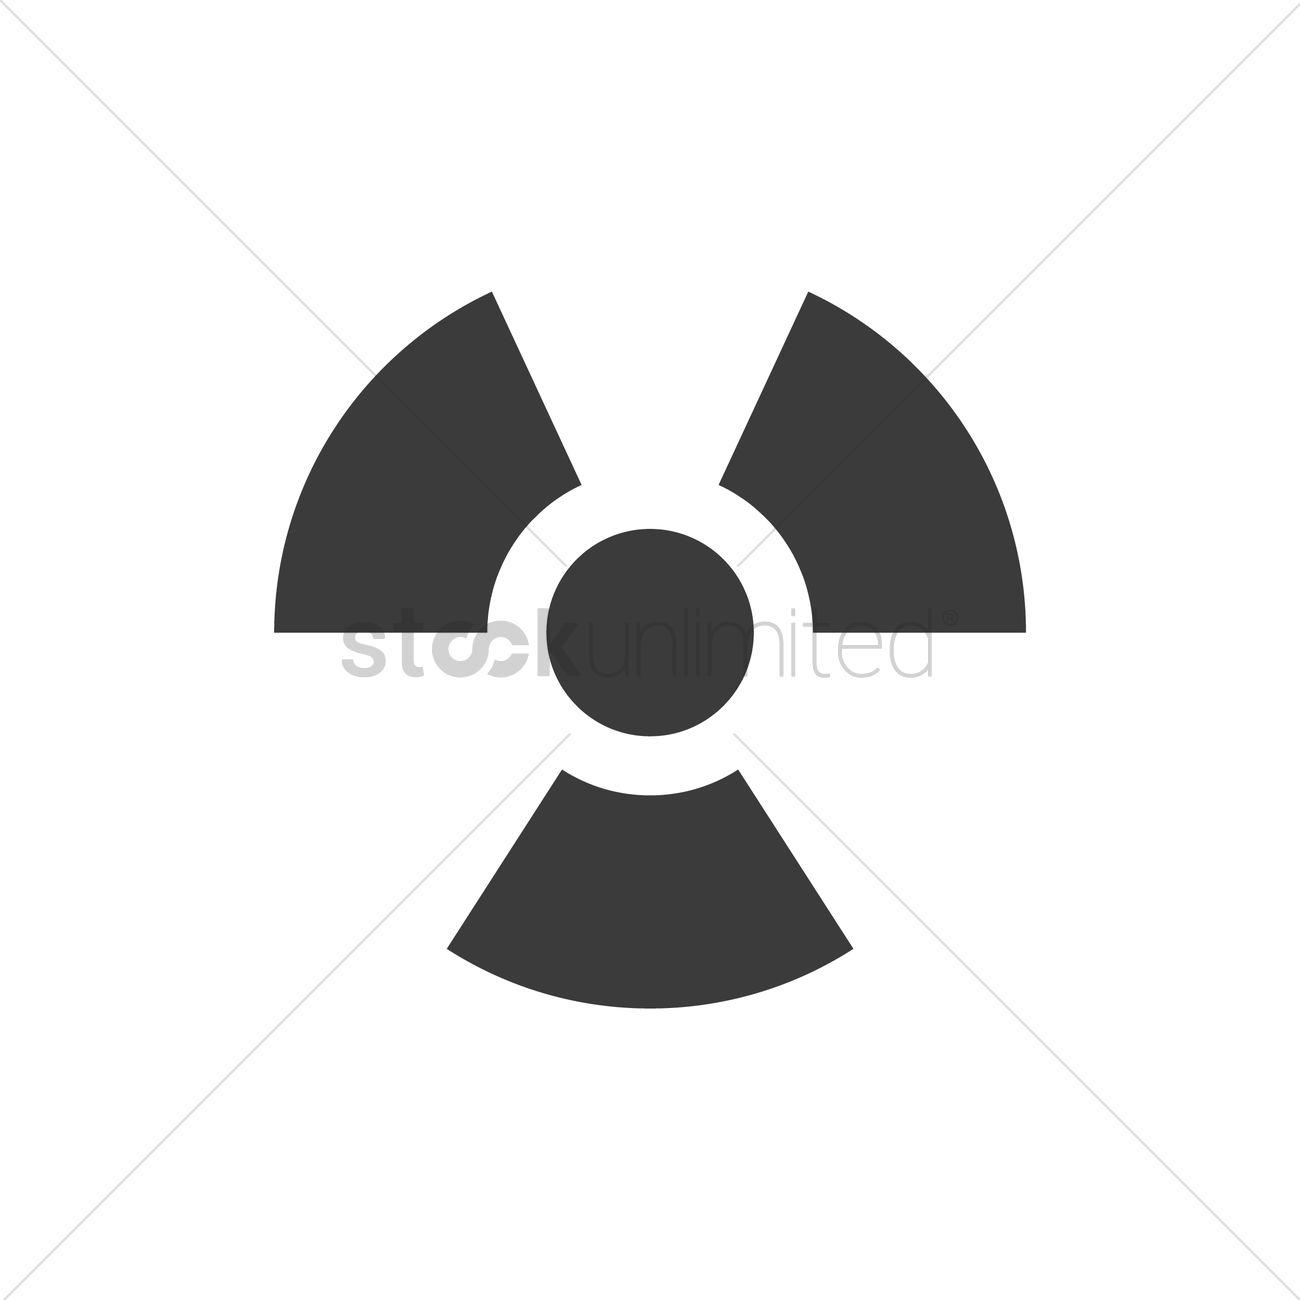 Radioactive symbol vector image 2029531 stockunlimited radioactive symbol vector graphic buycottarizona